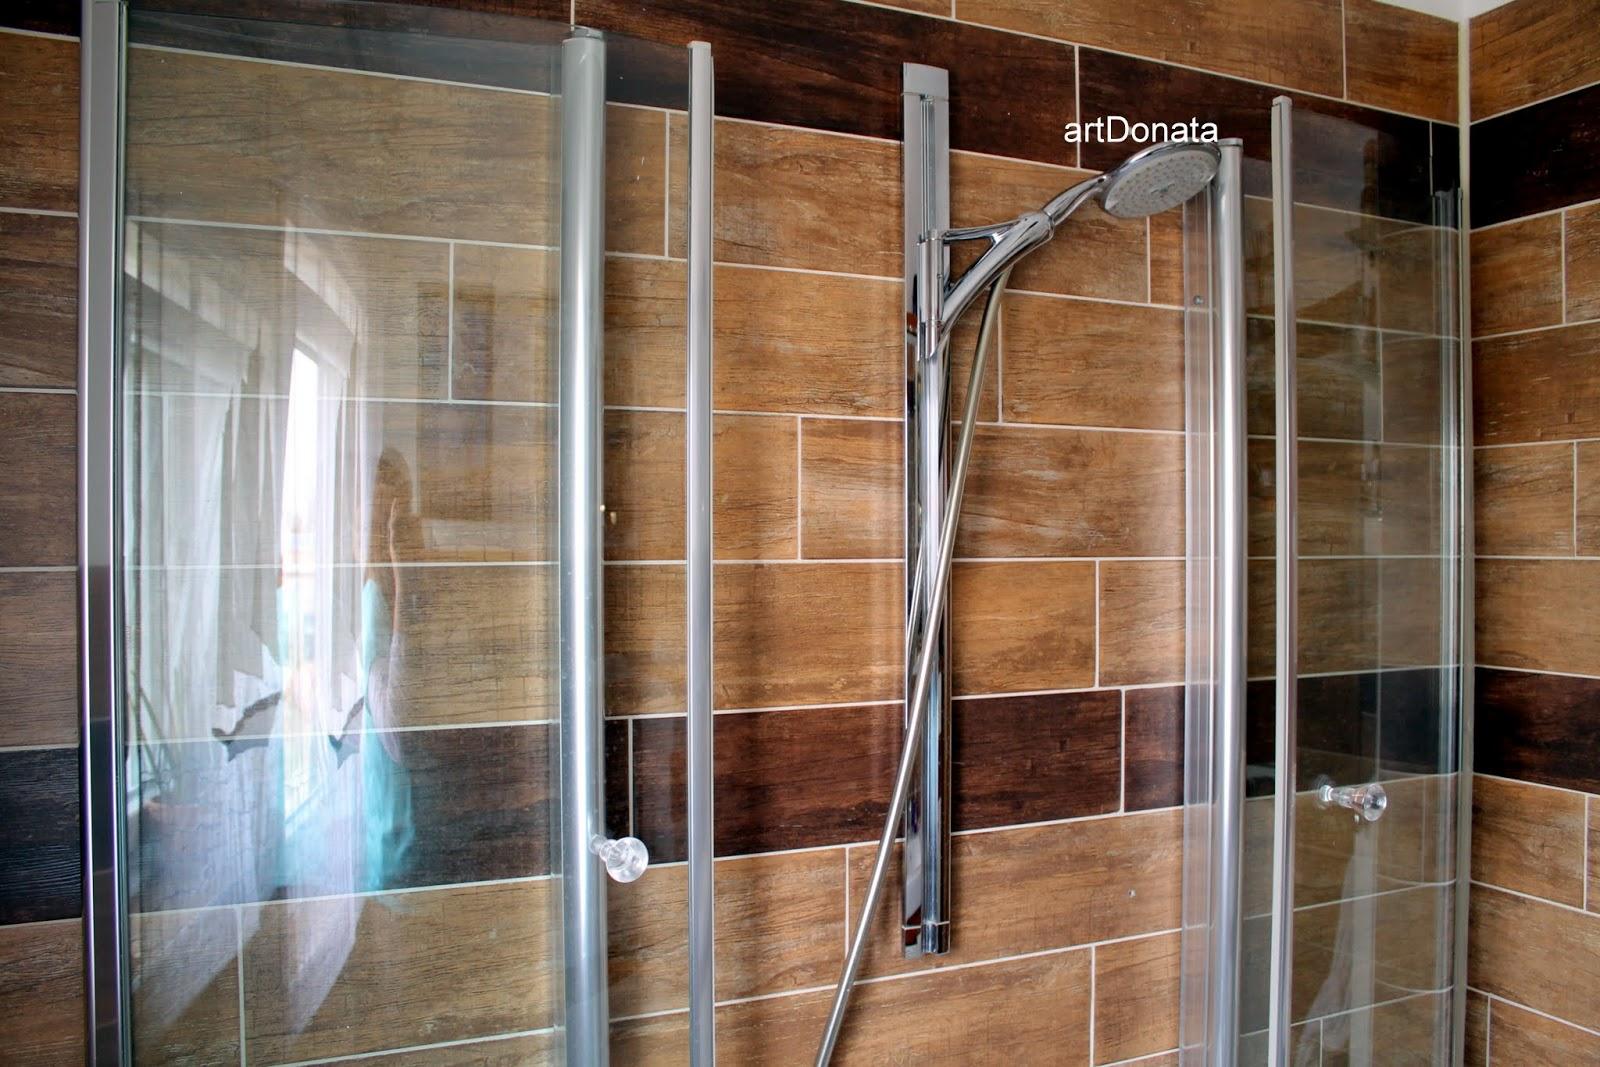 artDonata: Das Bad ist fertig! / Lazieka skonczona!